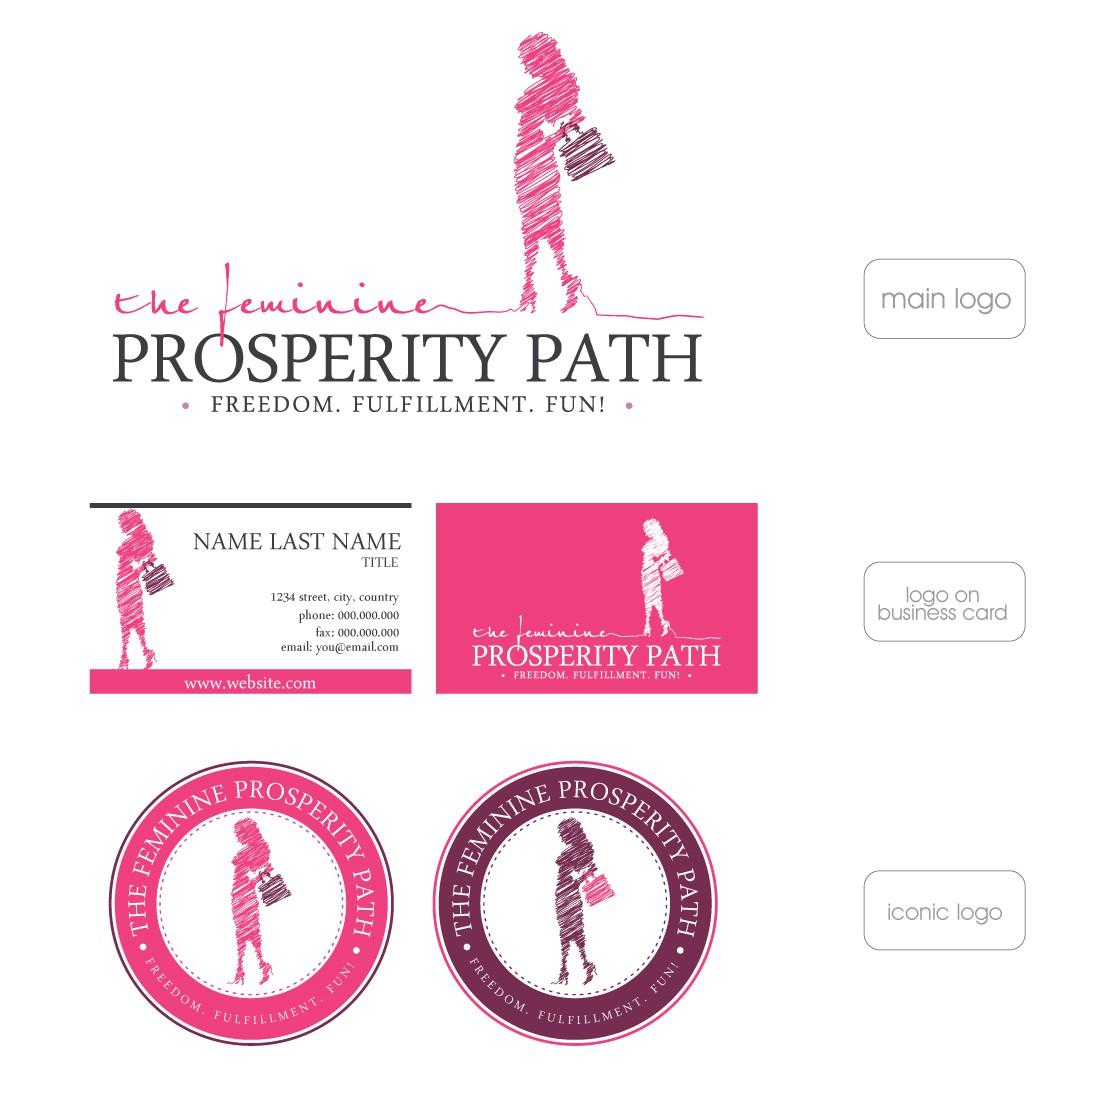 Feminine Prosperity Path needs a new logo